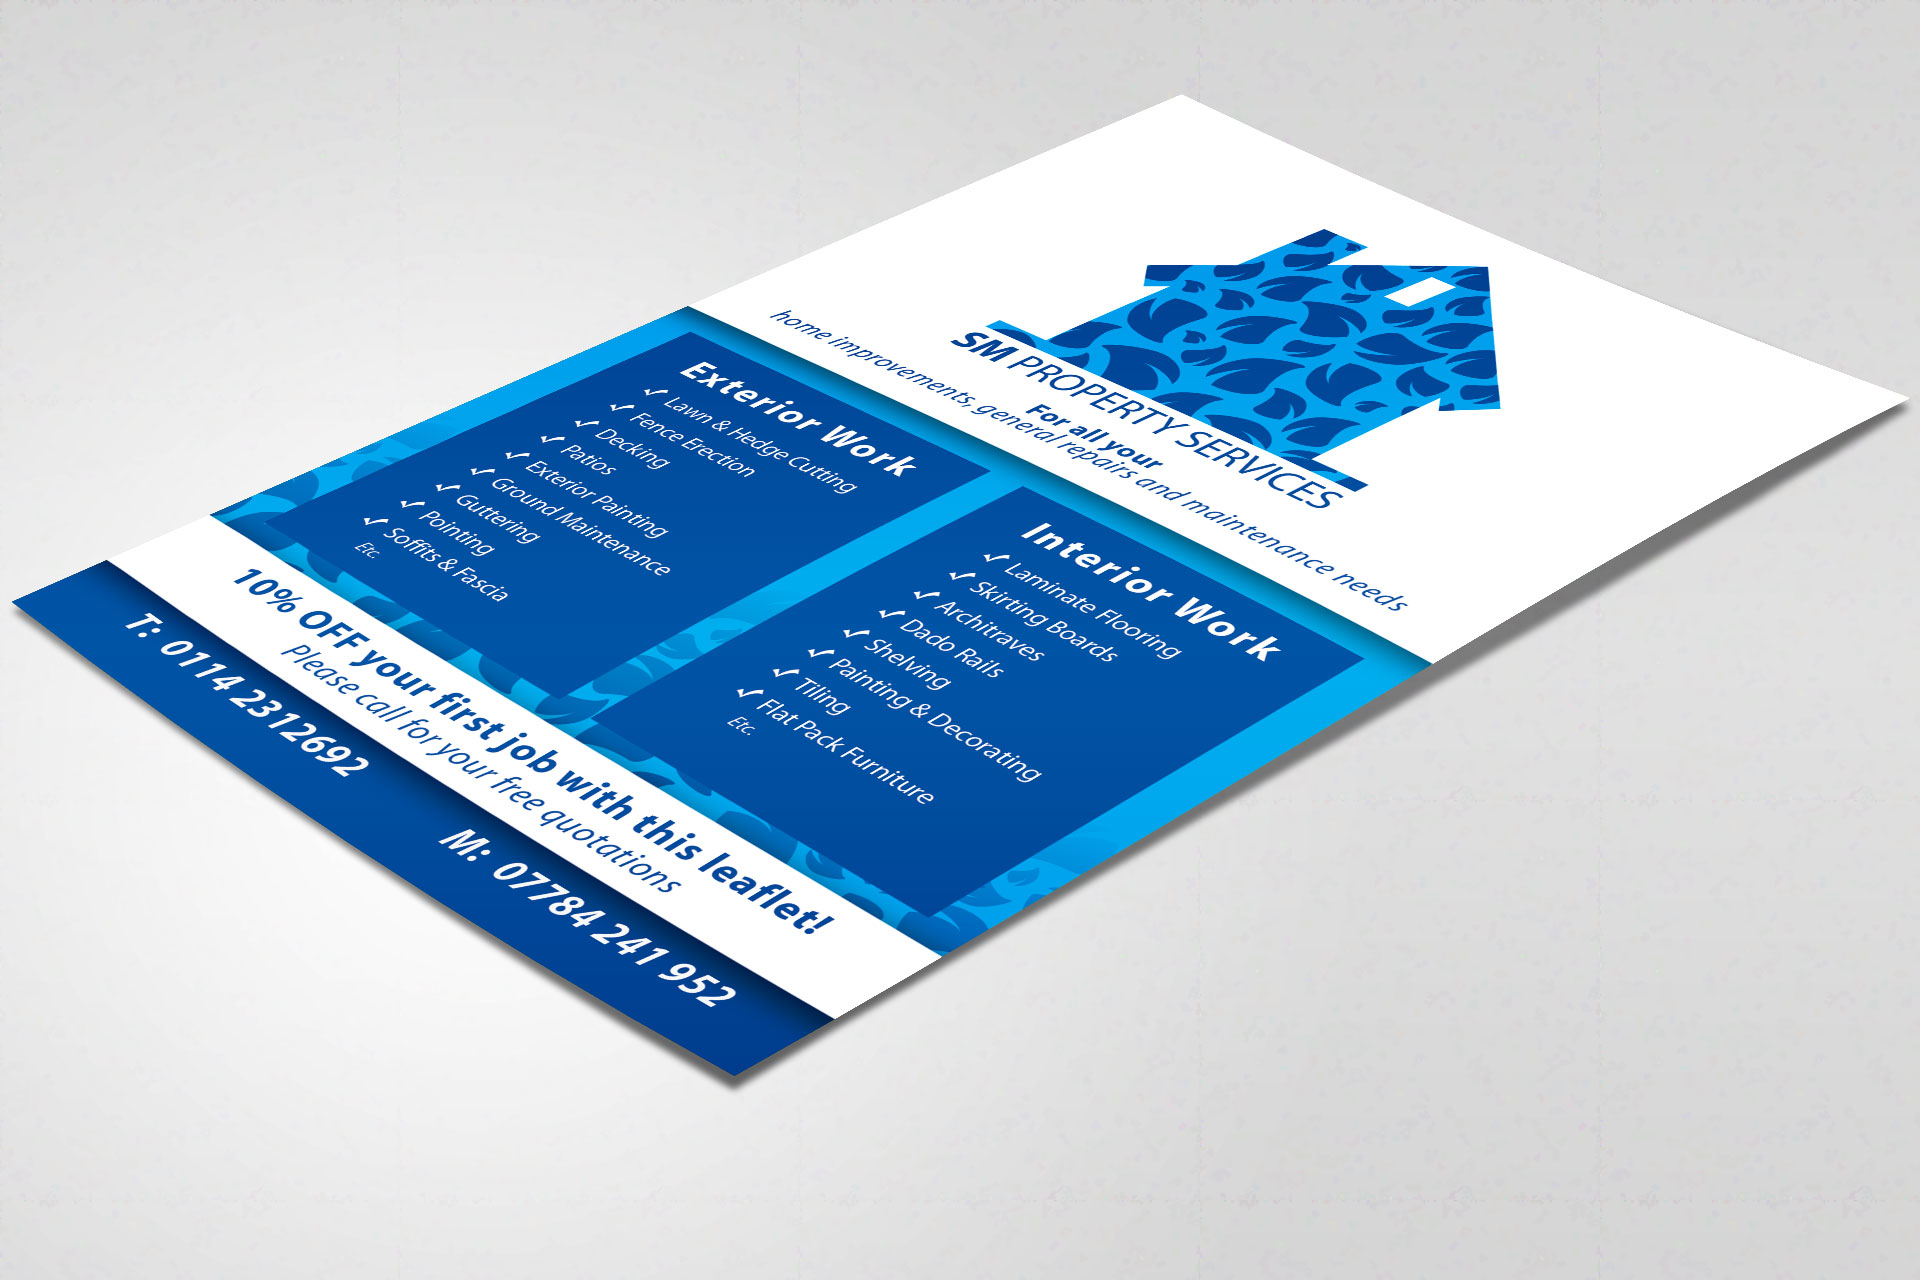 portfolio sm property services flyer sm property services flyer design